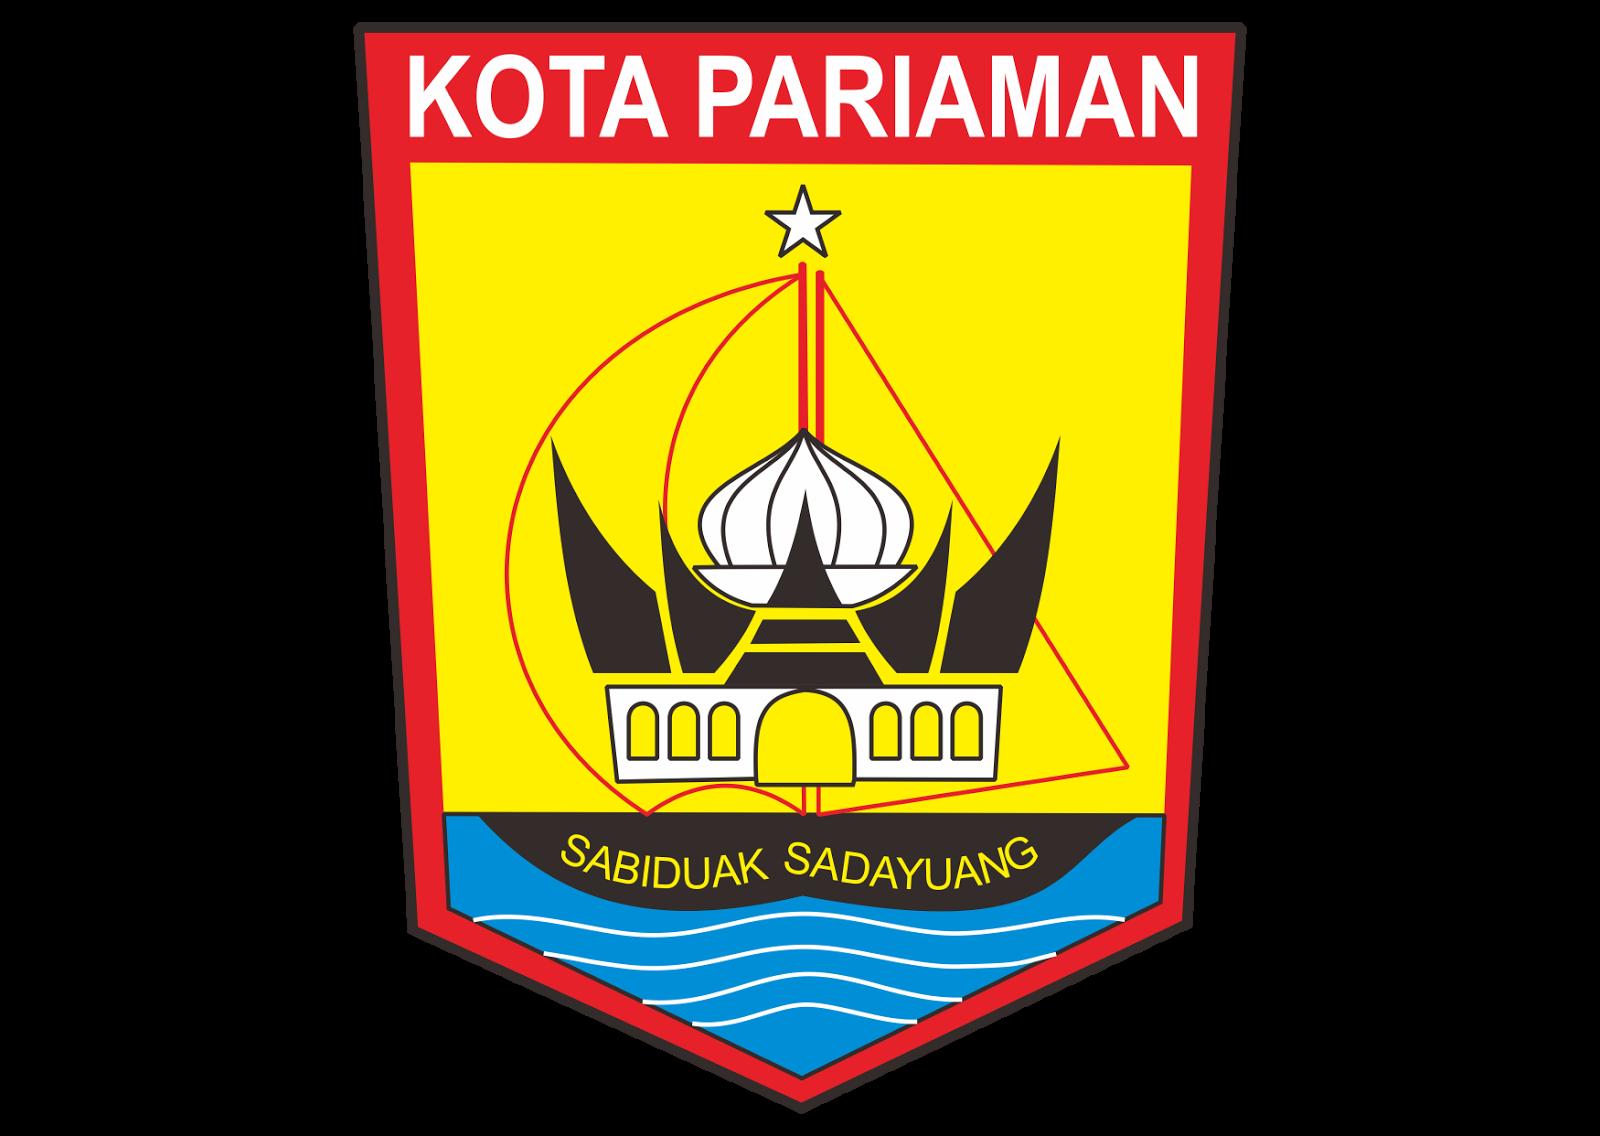 Memahami Makna Logo Daerah Kota Pariaman Media Terobos